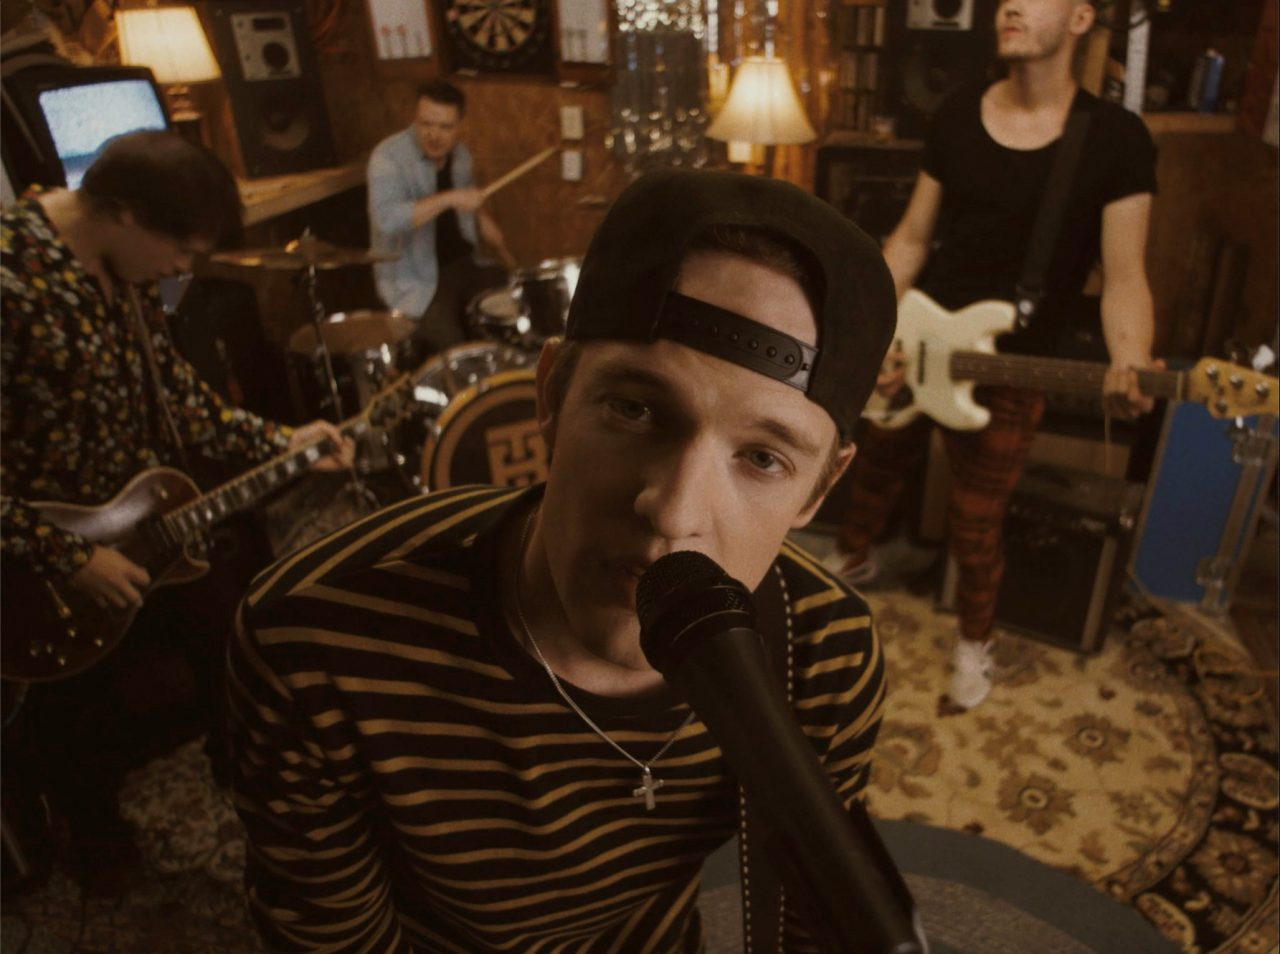 Watch Tucker Beathard Get Even in 'Better Than Me' Video